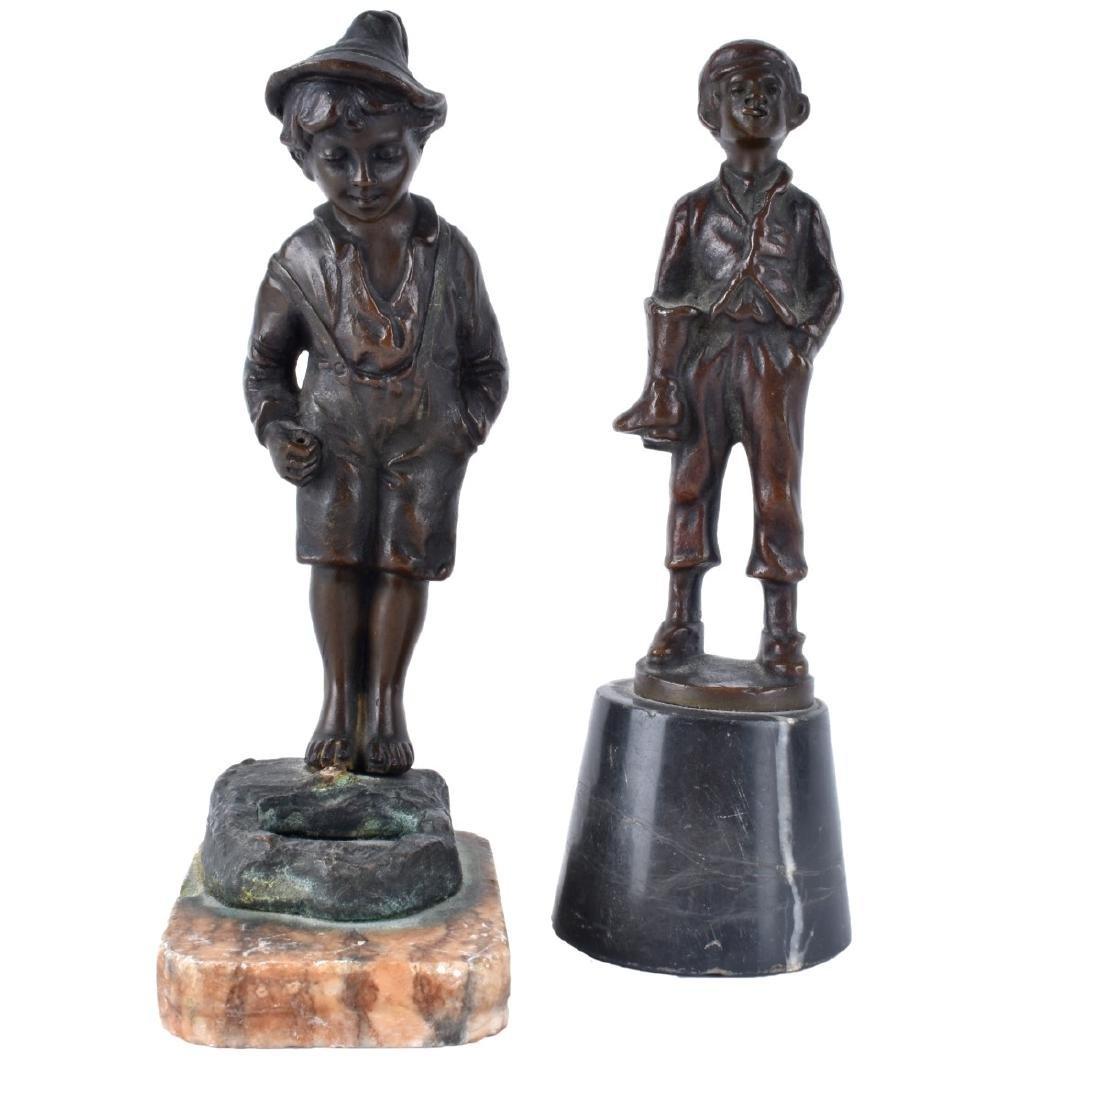 Two Miniature Bronzes